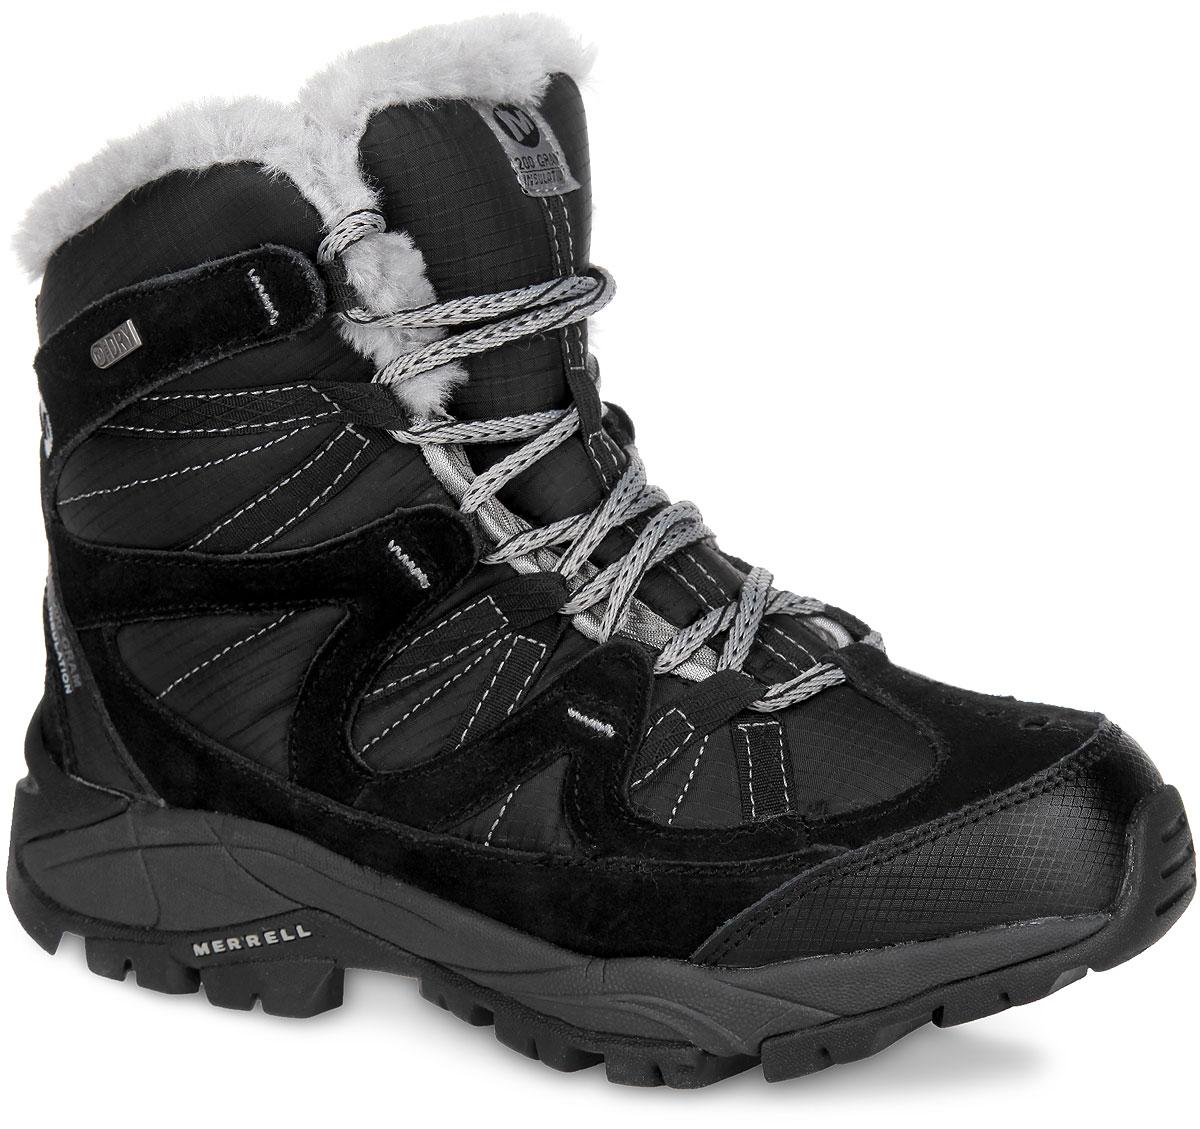 Ботинки женские Breccia Waterproof. J258521C